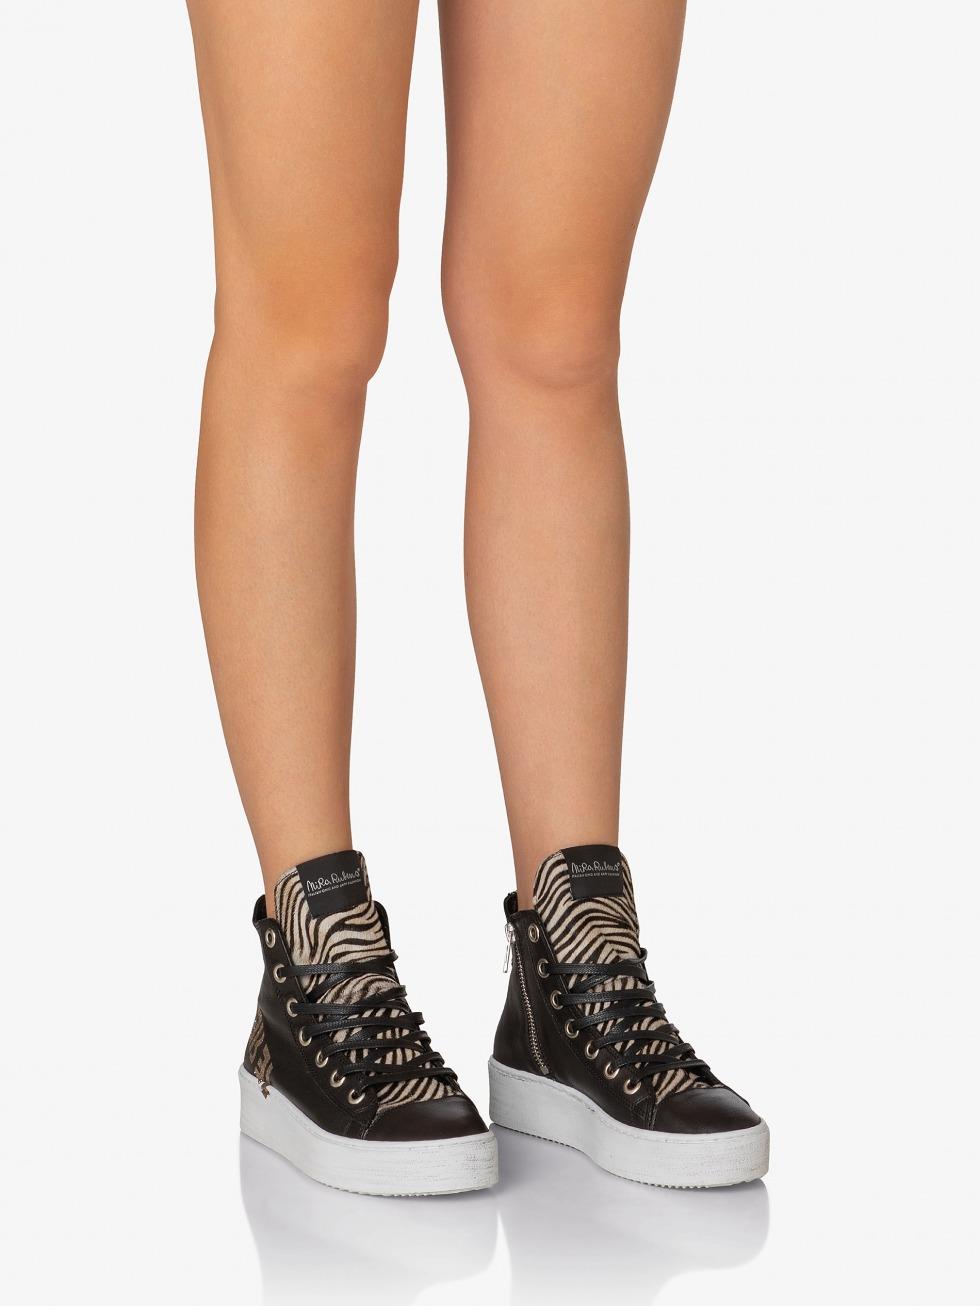 Long Island Sneakers - Rebel Black Zebrina Glitter